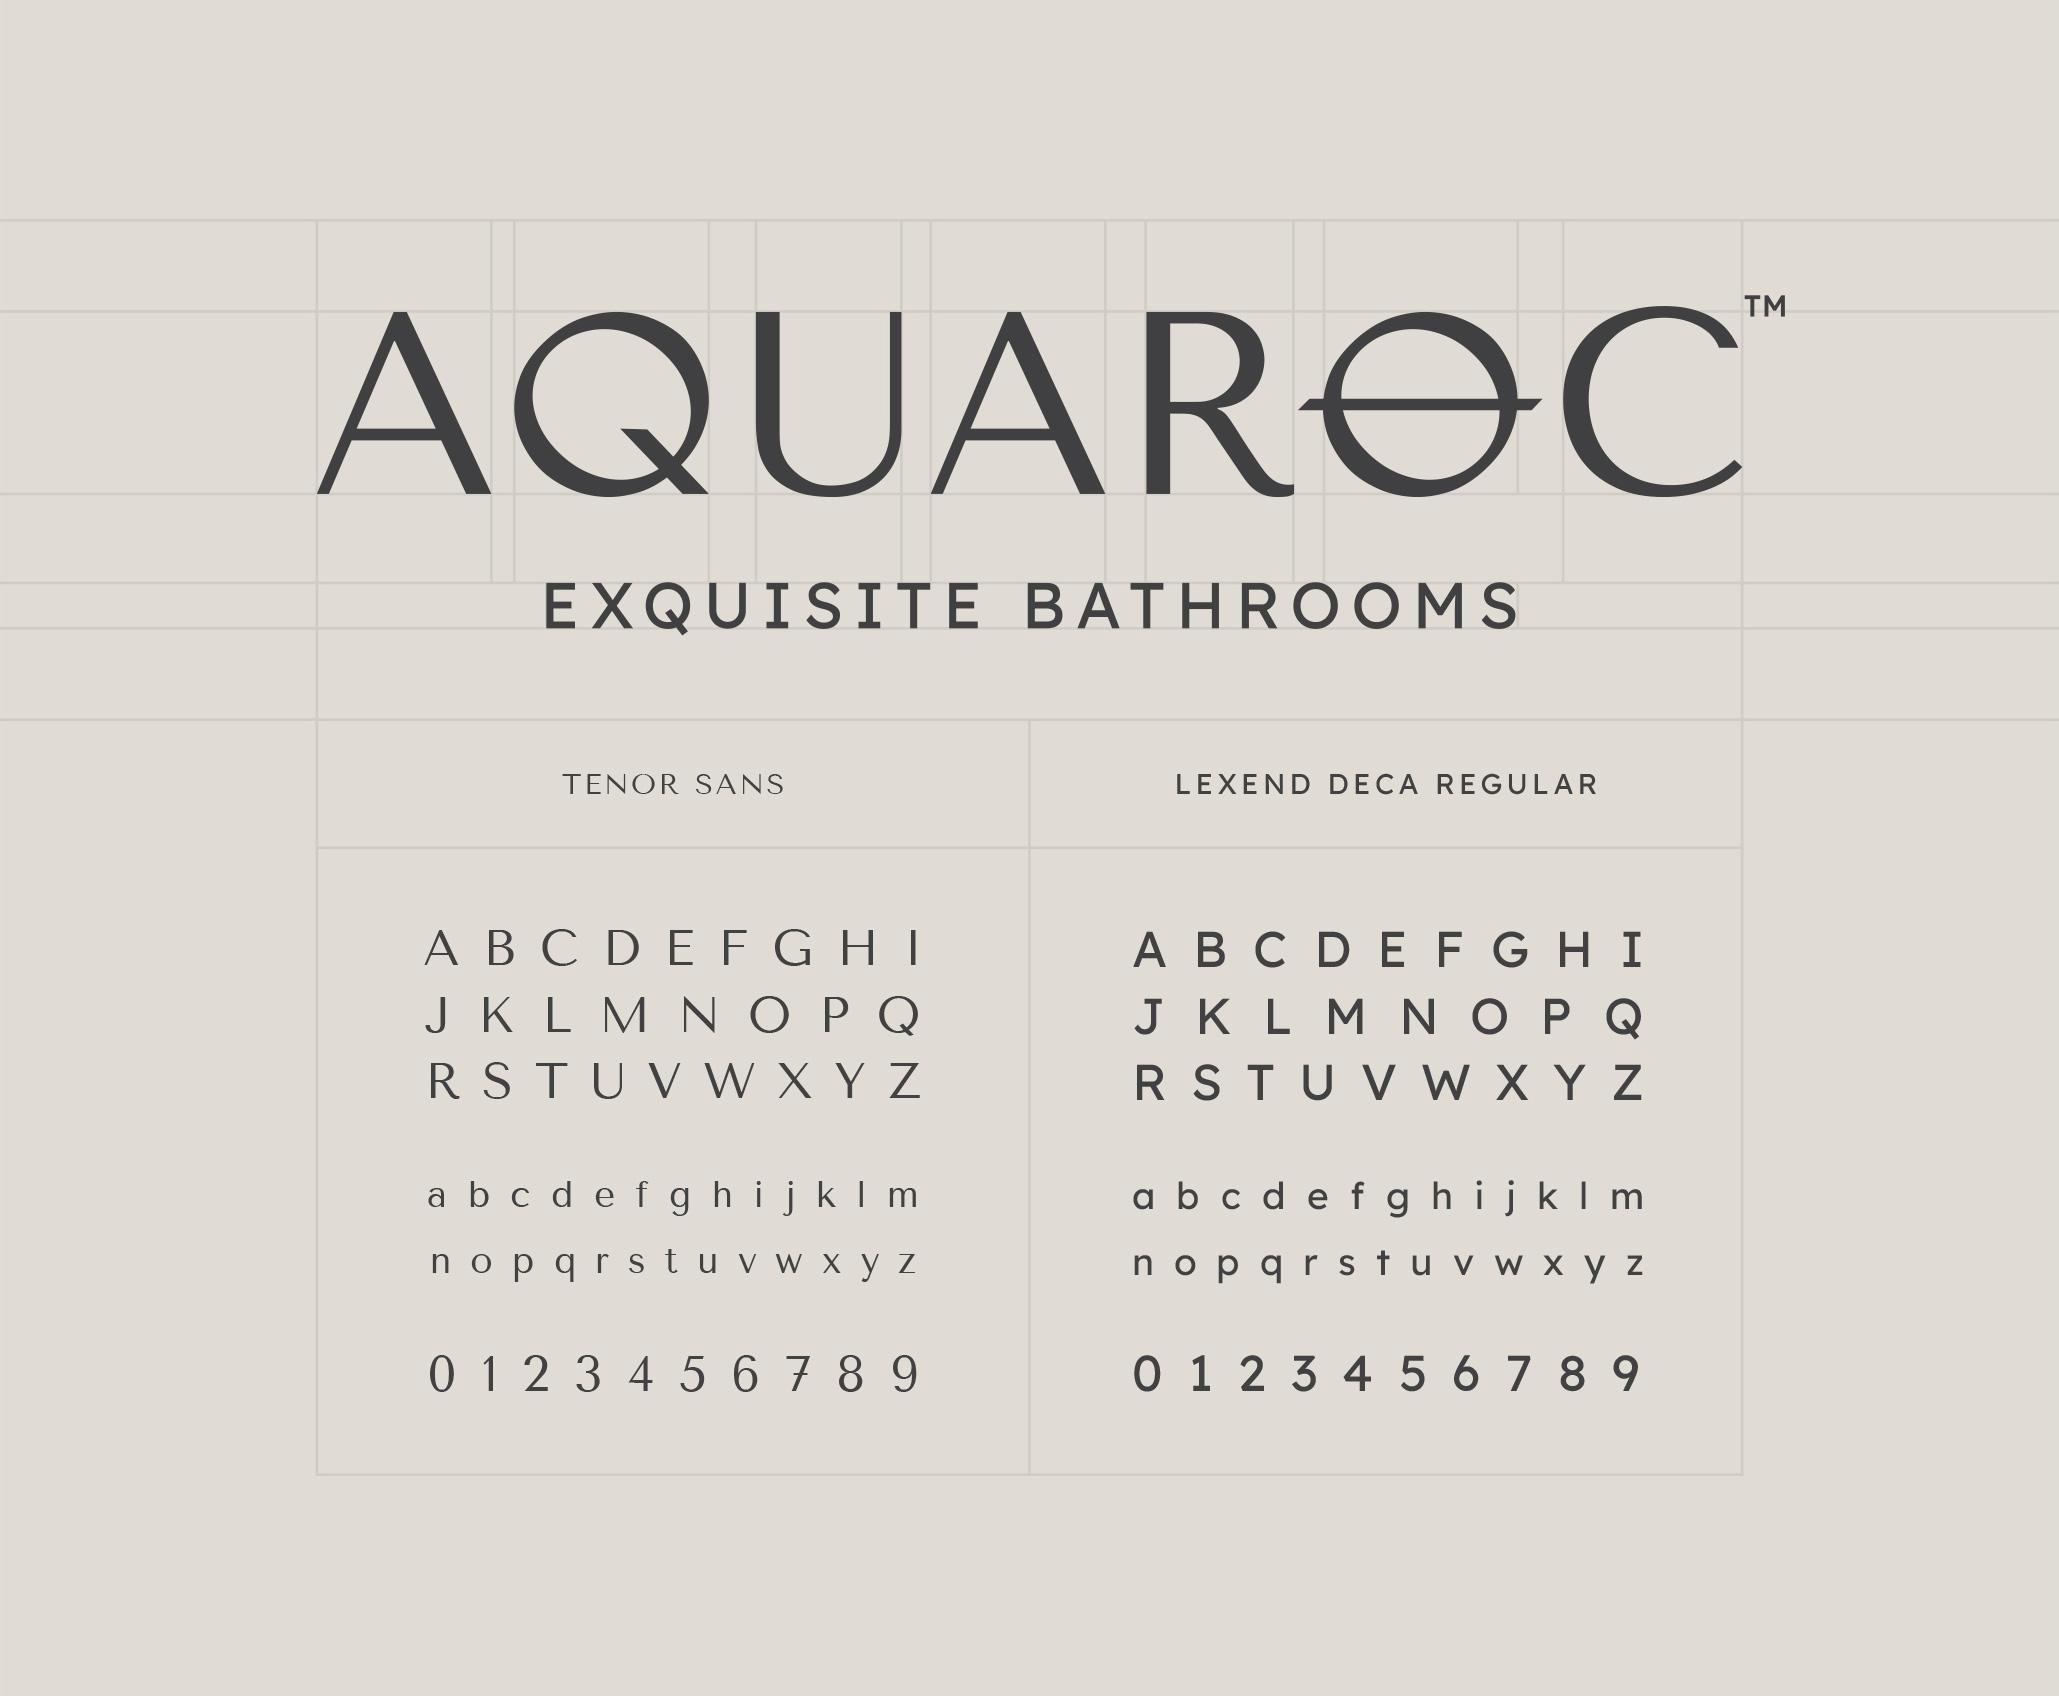 Aquaroc-04.jpg